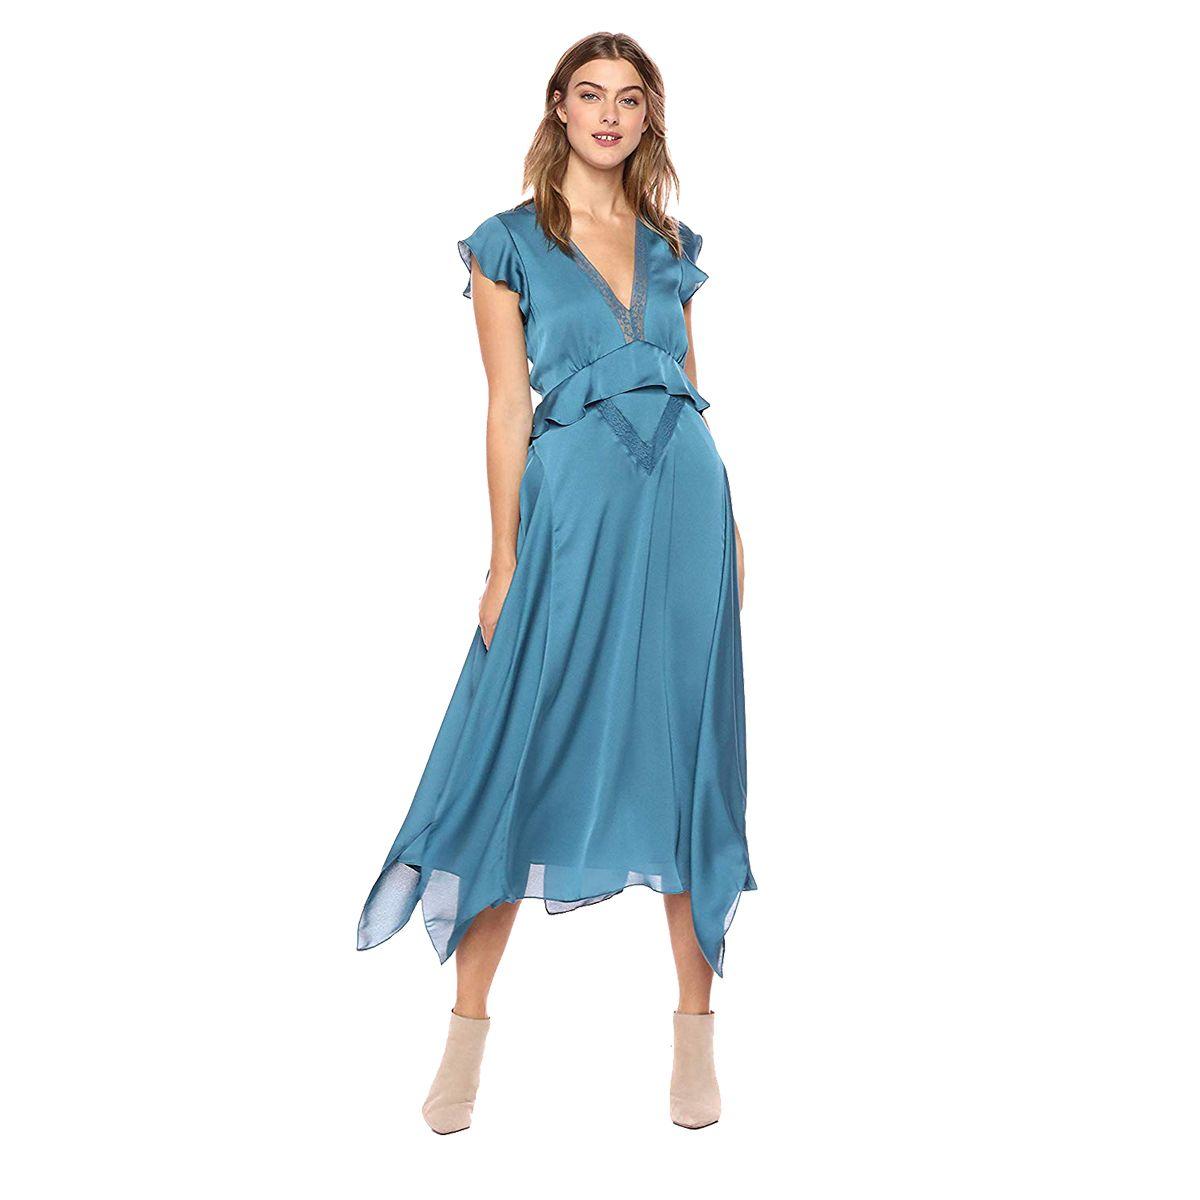 We Found 15 Gorgeous Wedding Guest Dresses On Amazon Tulip Wrap Dress Dresses Solid Maxi Dress [ 1200 x 1200 Pixel ]